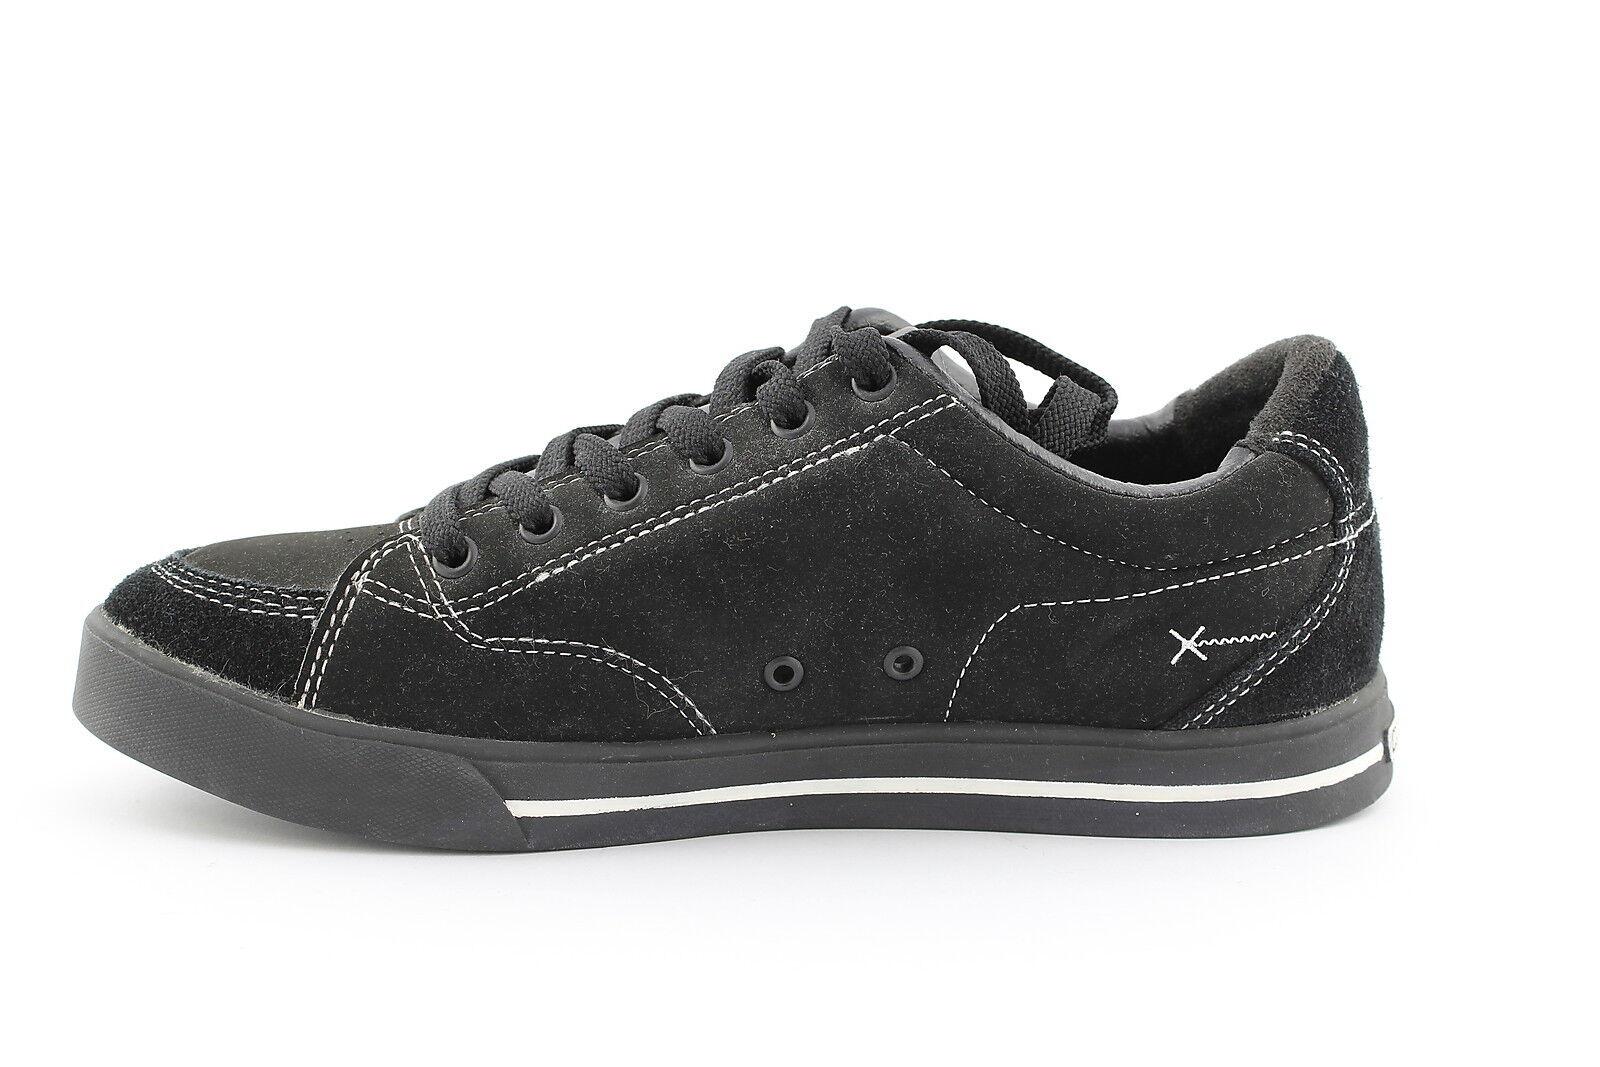 Scarpa da uomo nera pelle Kustom aston skateboard skateboard skateboard skate casual scarpe da ginnastica moda   Design lussureggiante    Maschio/Ragazze Scarpa  04fa58